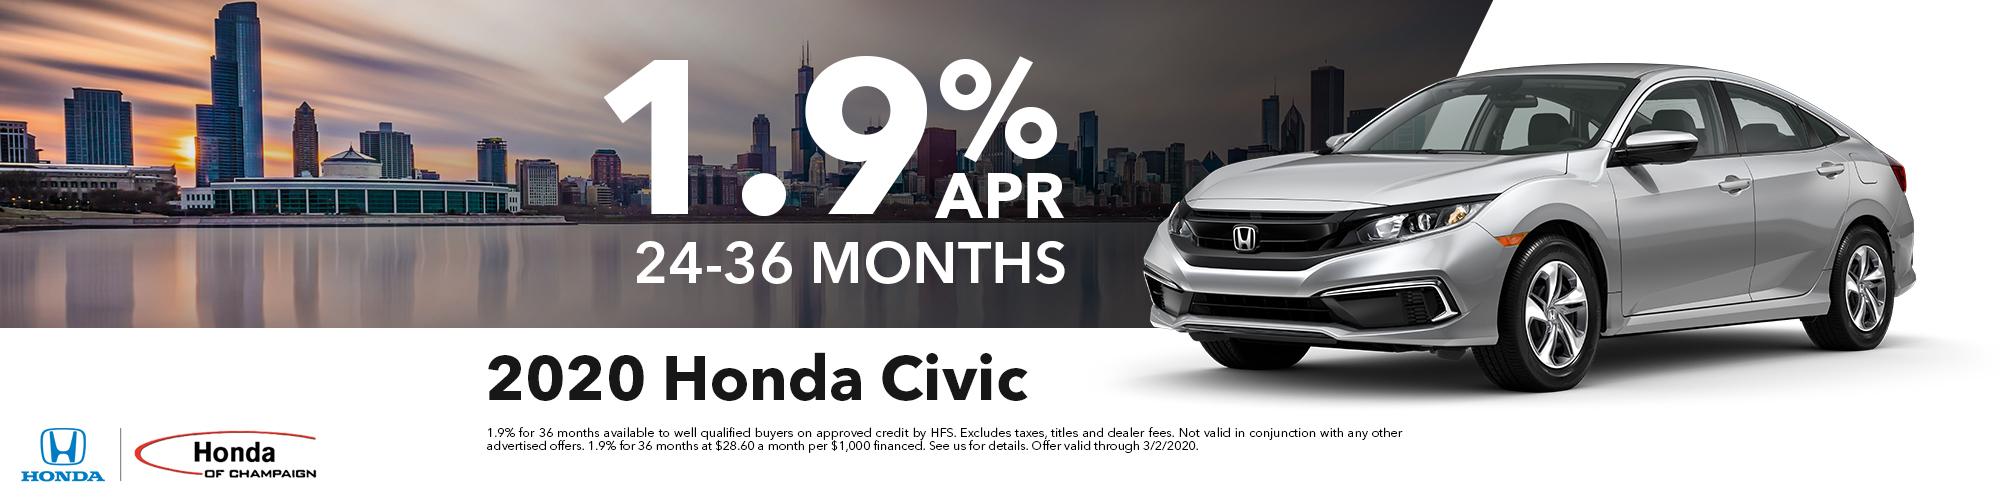 Honda Civic Special